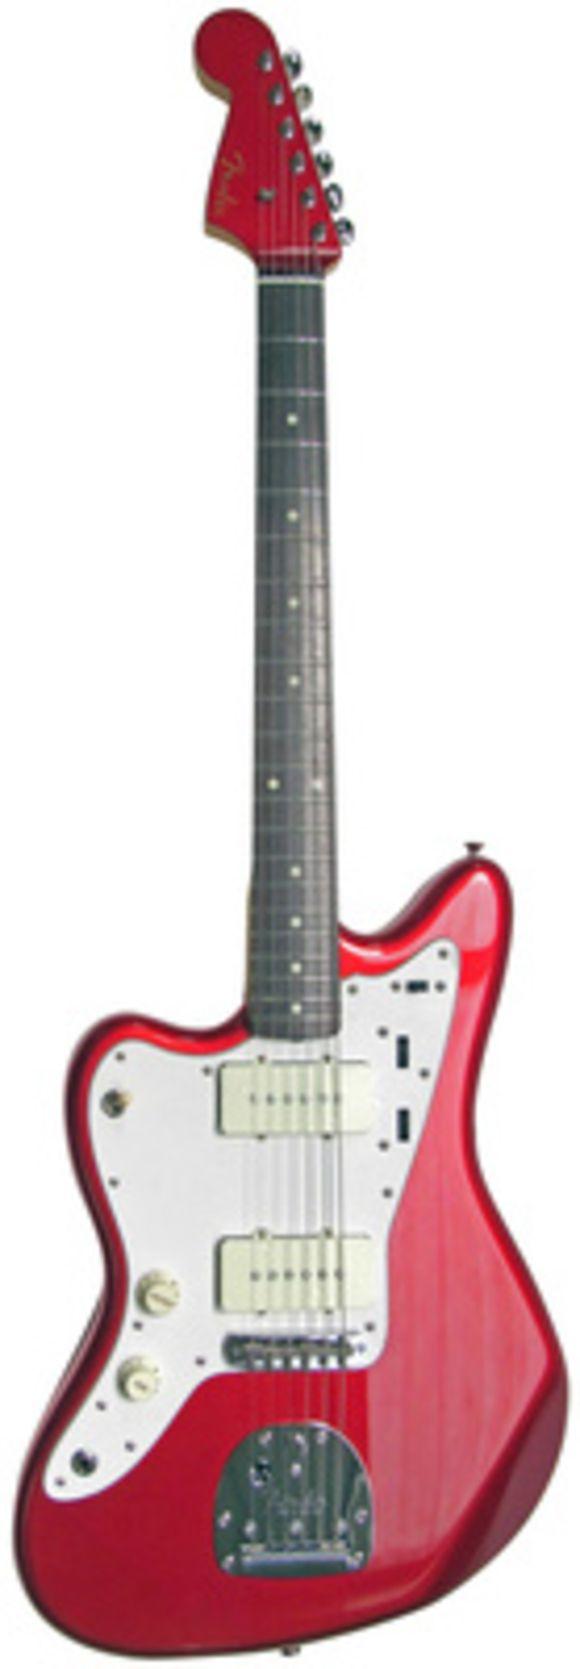 Trad 60´s Jazzmaster CAR LH Fender